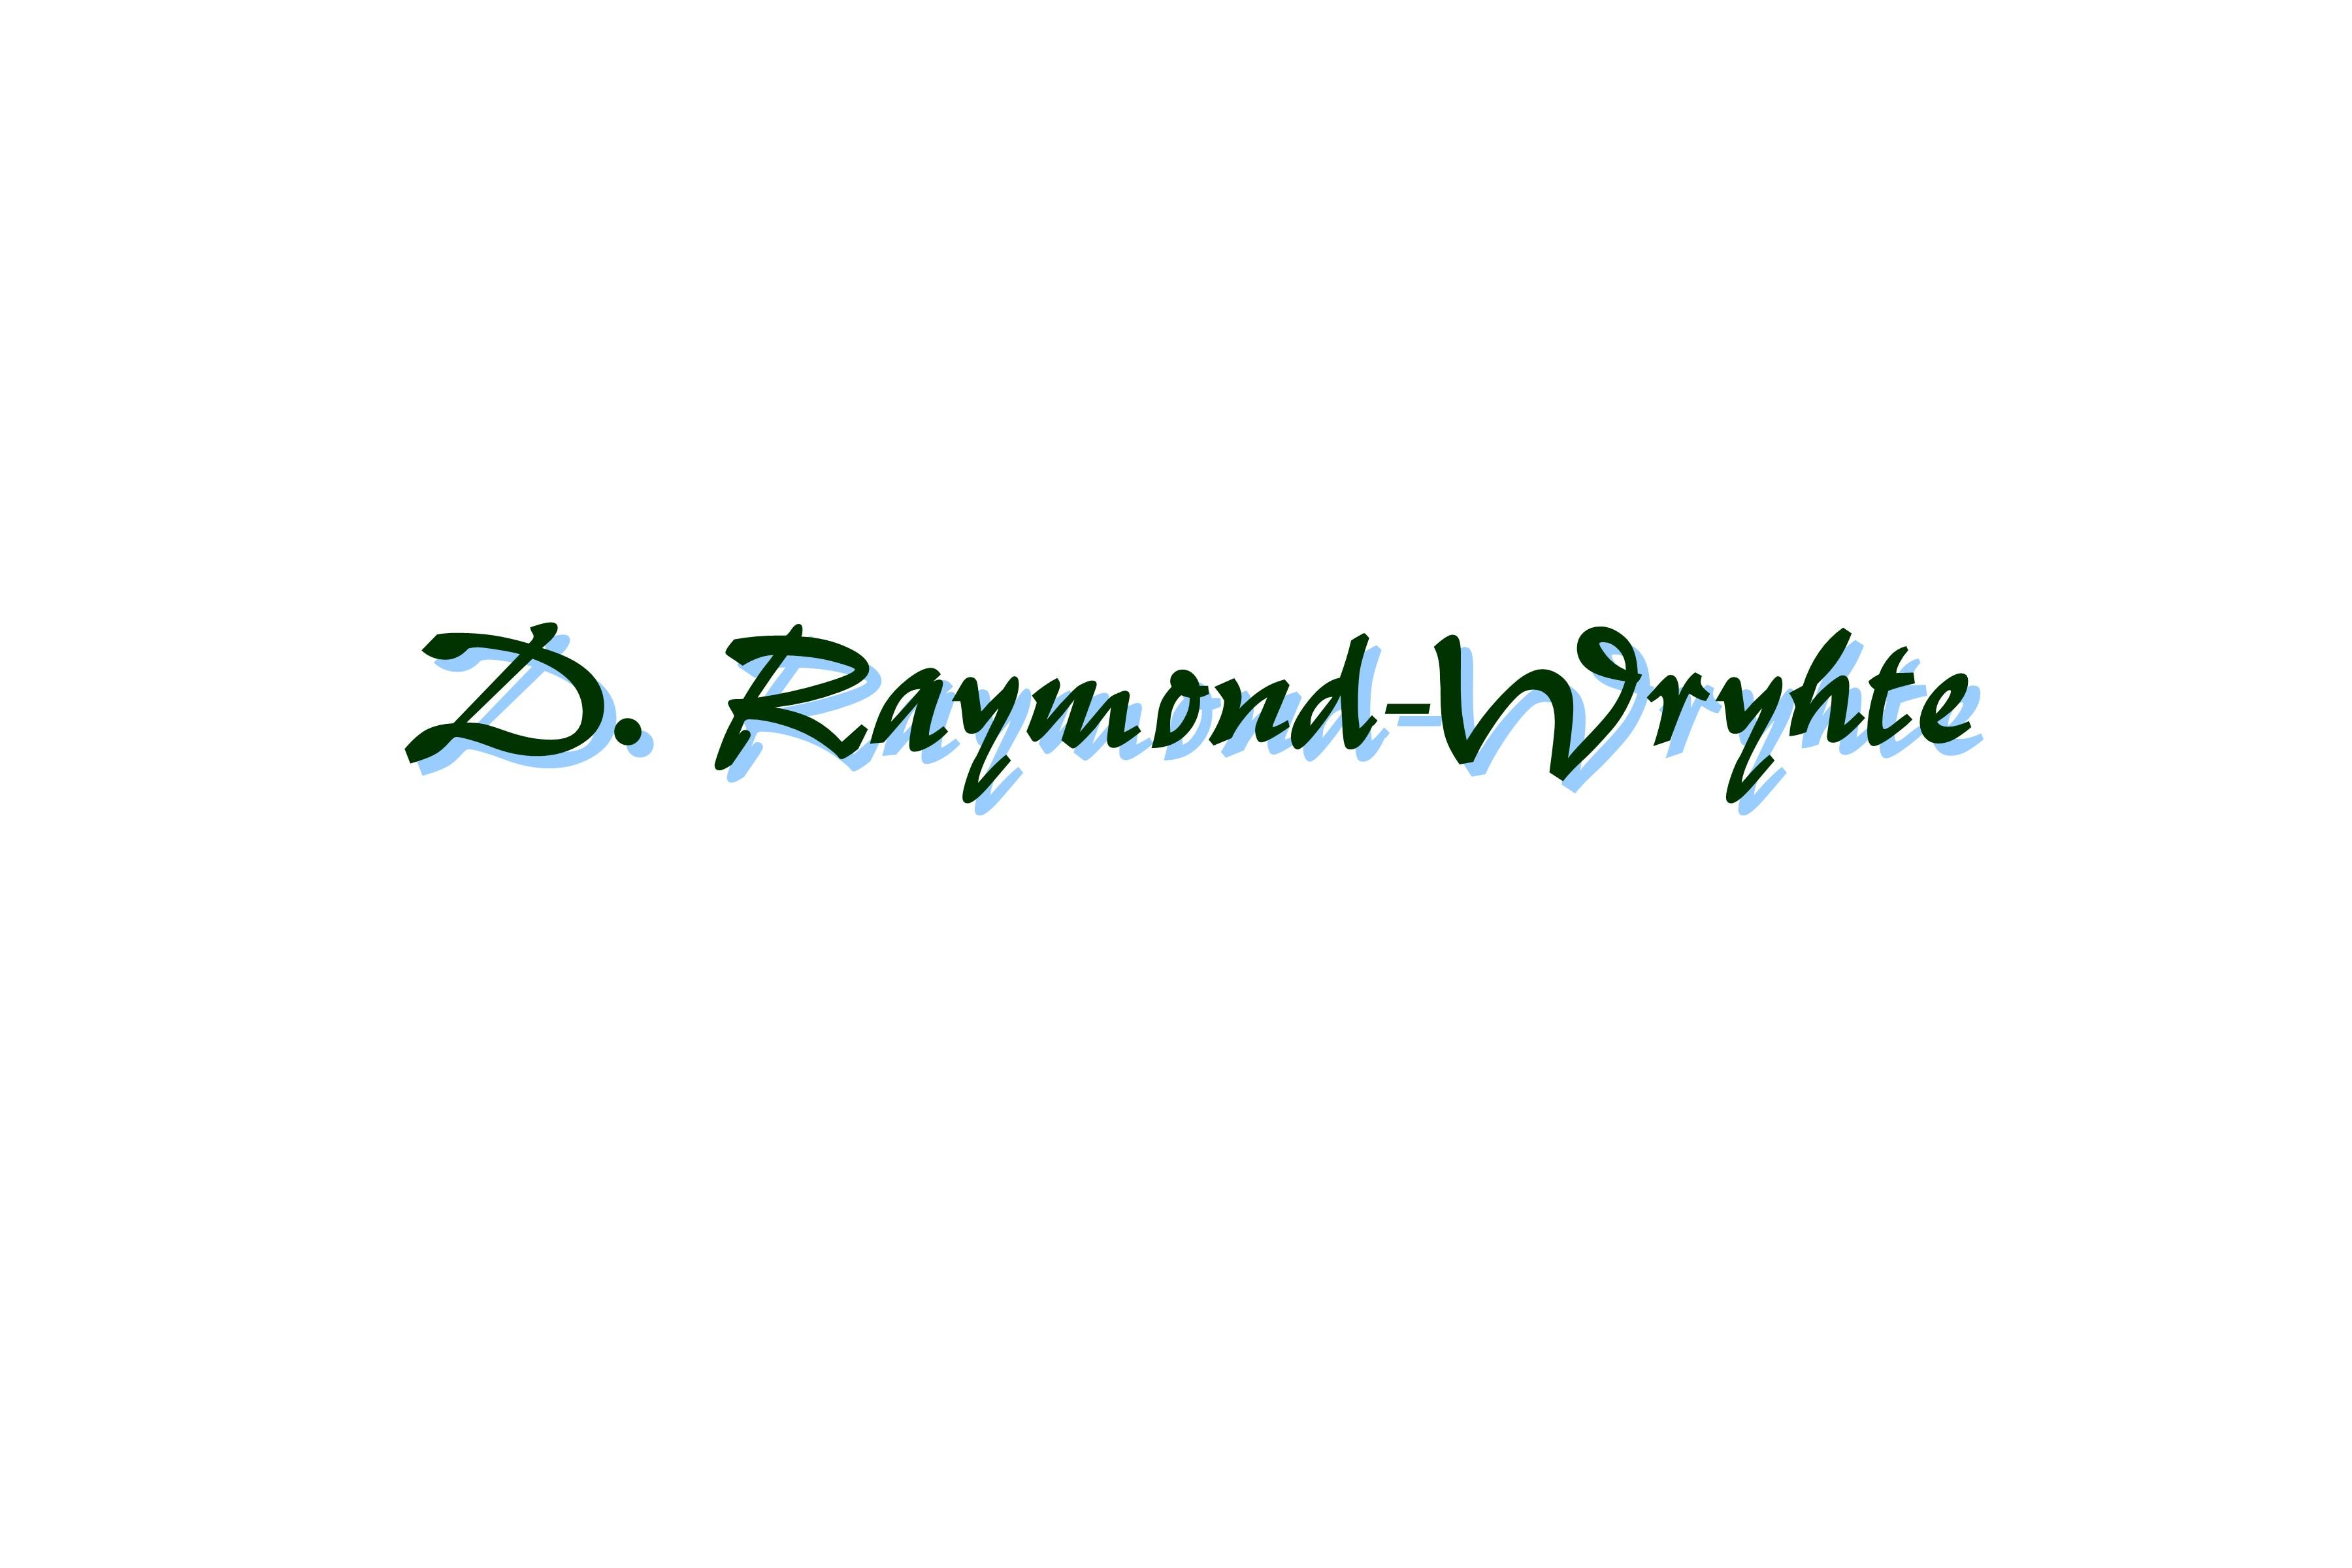 d. Raymond-Wryhte's Signature